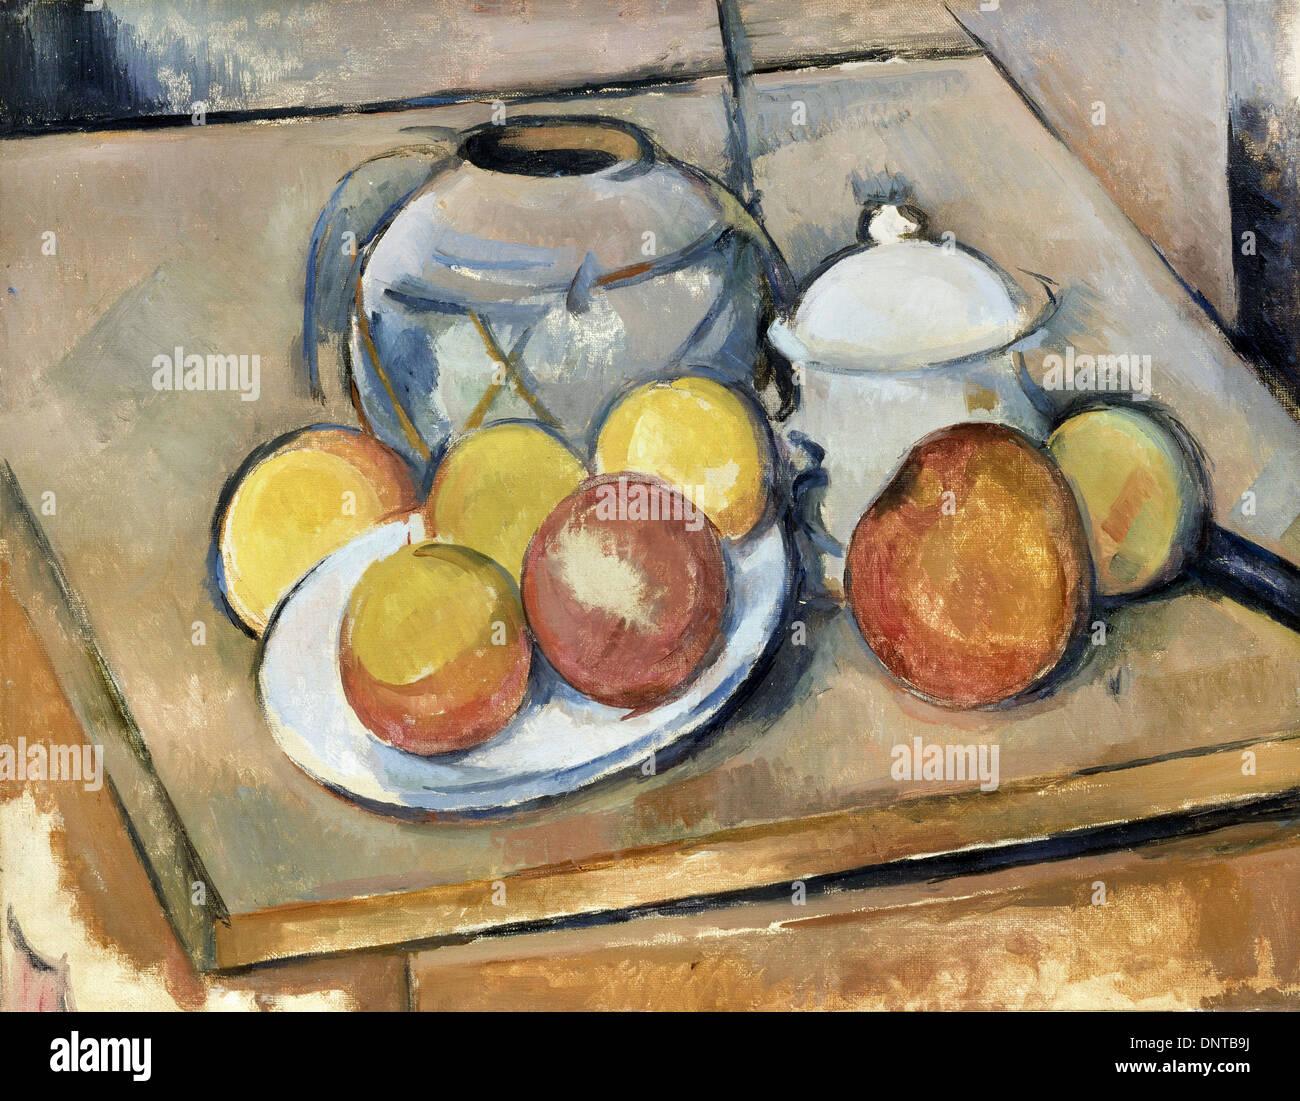 Paul Cezanne, Straw-Trimmed Vase, Sugar Bowl and Apples 1890-1893 Oil on canvas. Musee de l'Orangerie, Paris, France. - Stock Image